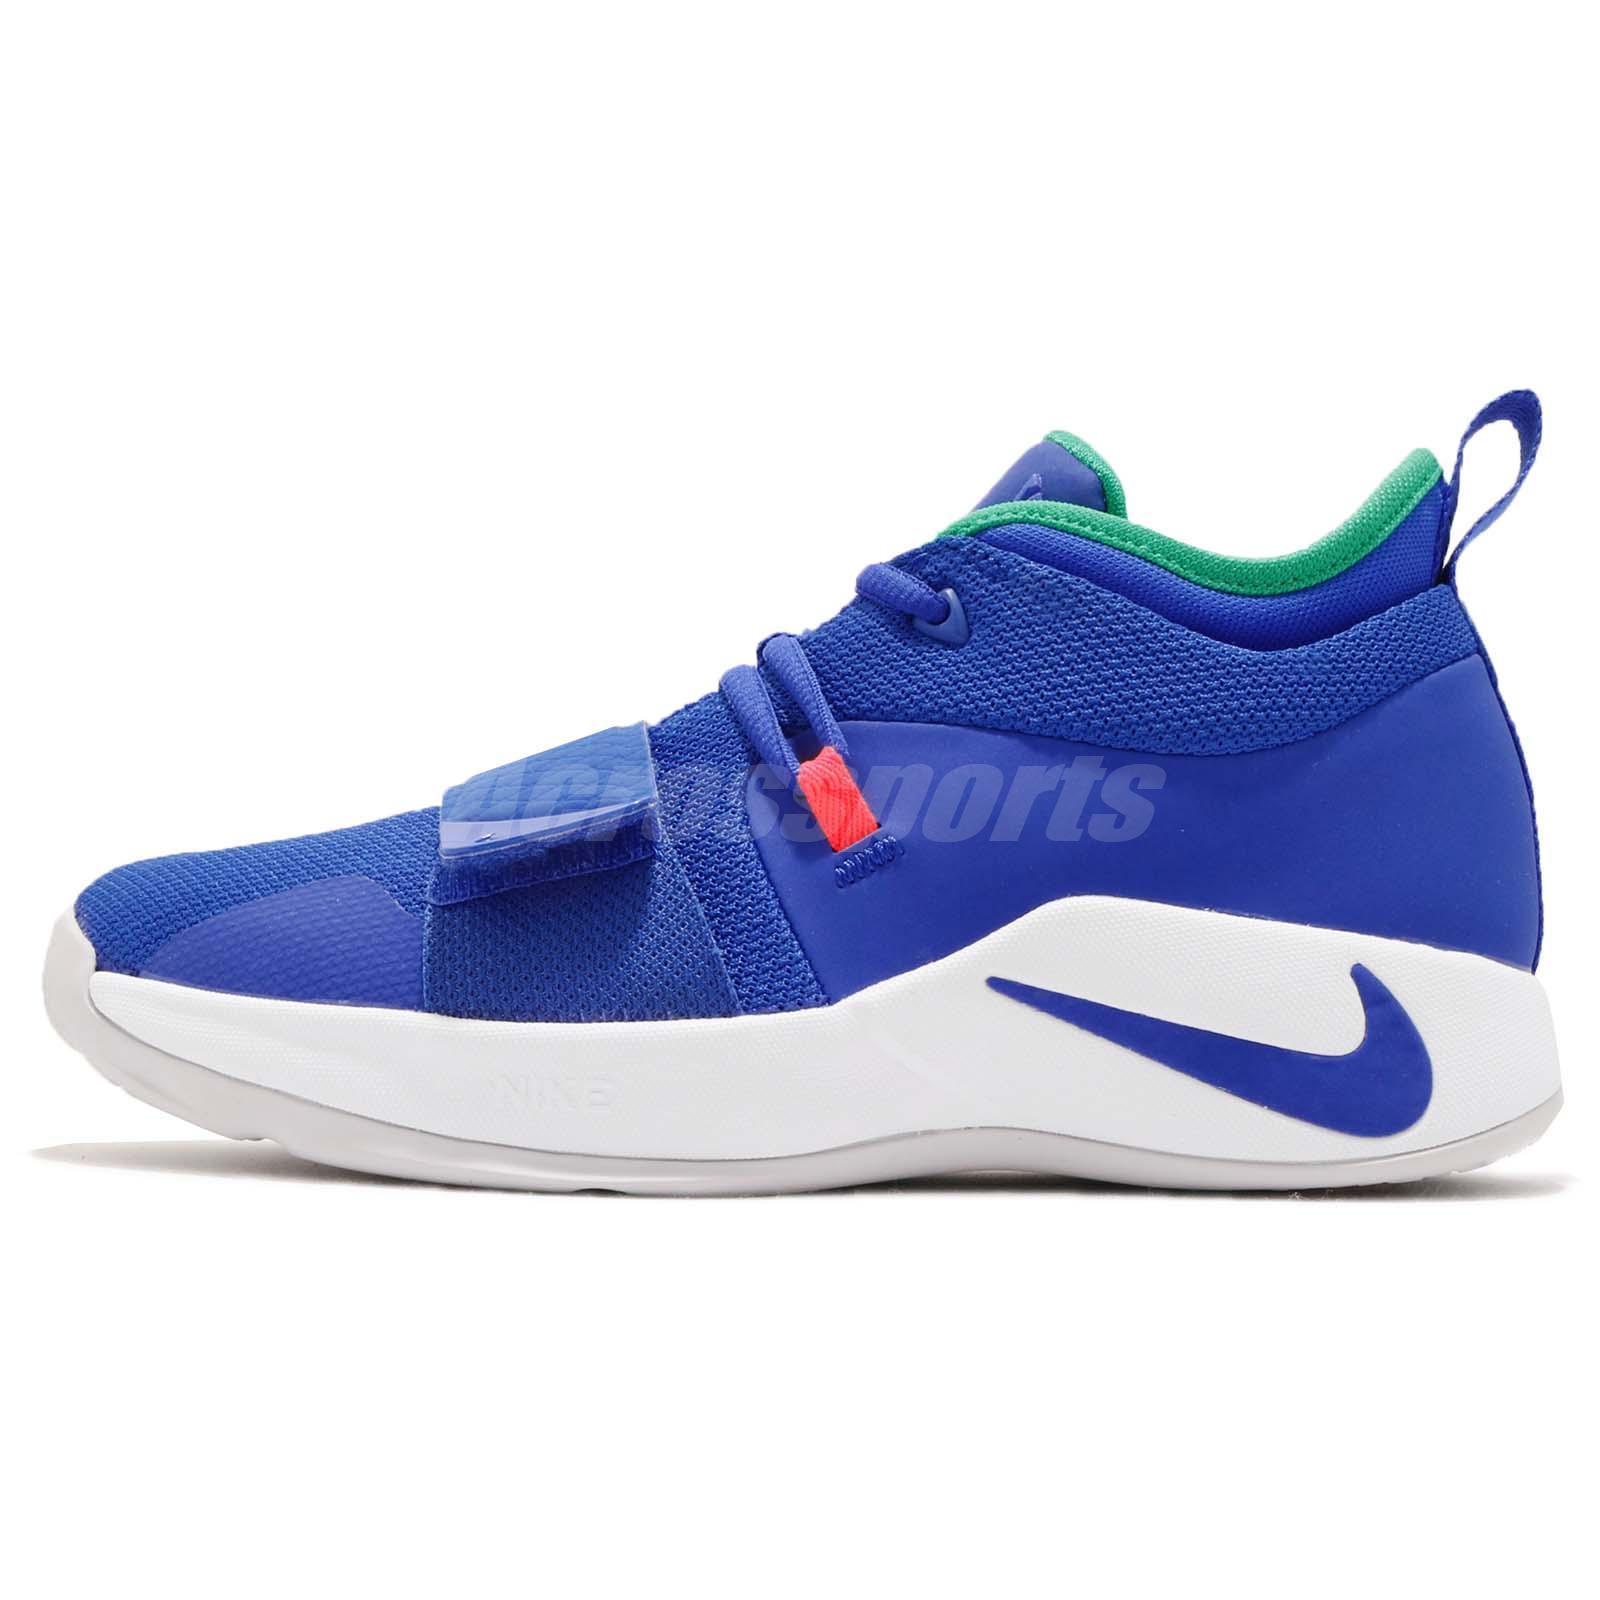 496ba34e5caa Nike PG 2.5 GS Paul George Fortnite Racer Blue Kid Youth Women Shoes BQ9457 -401